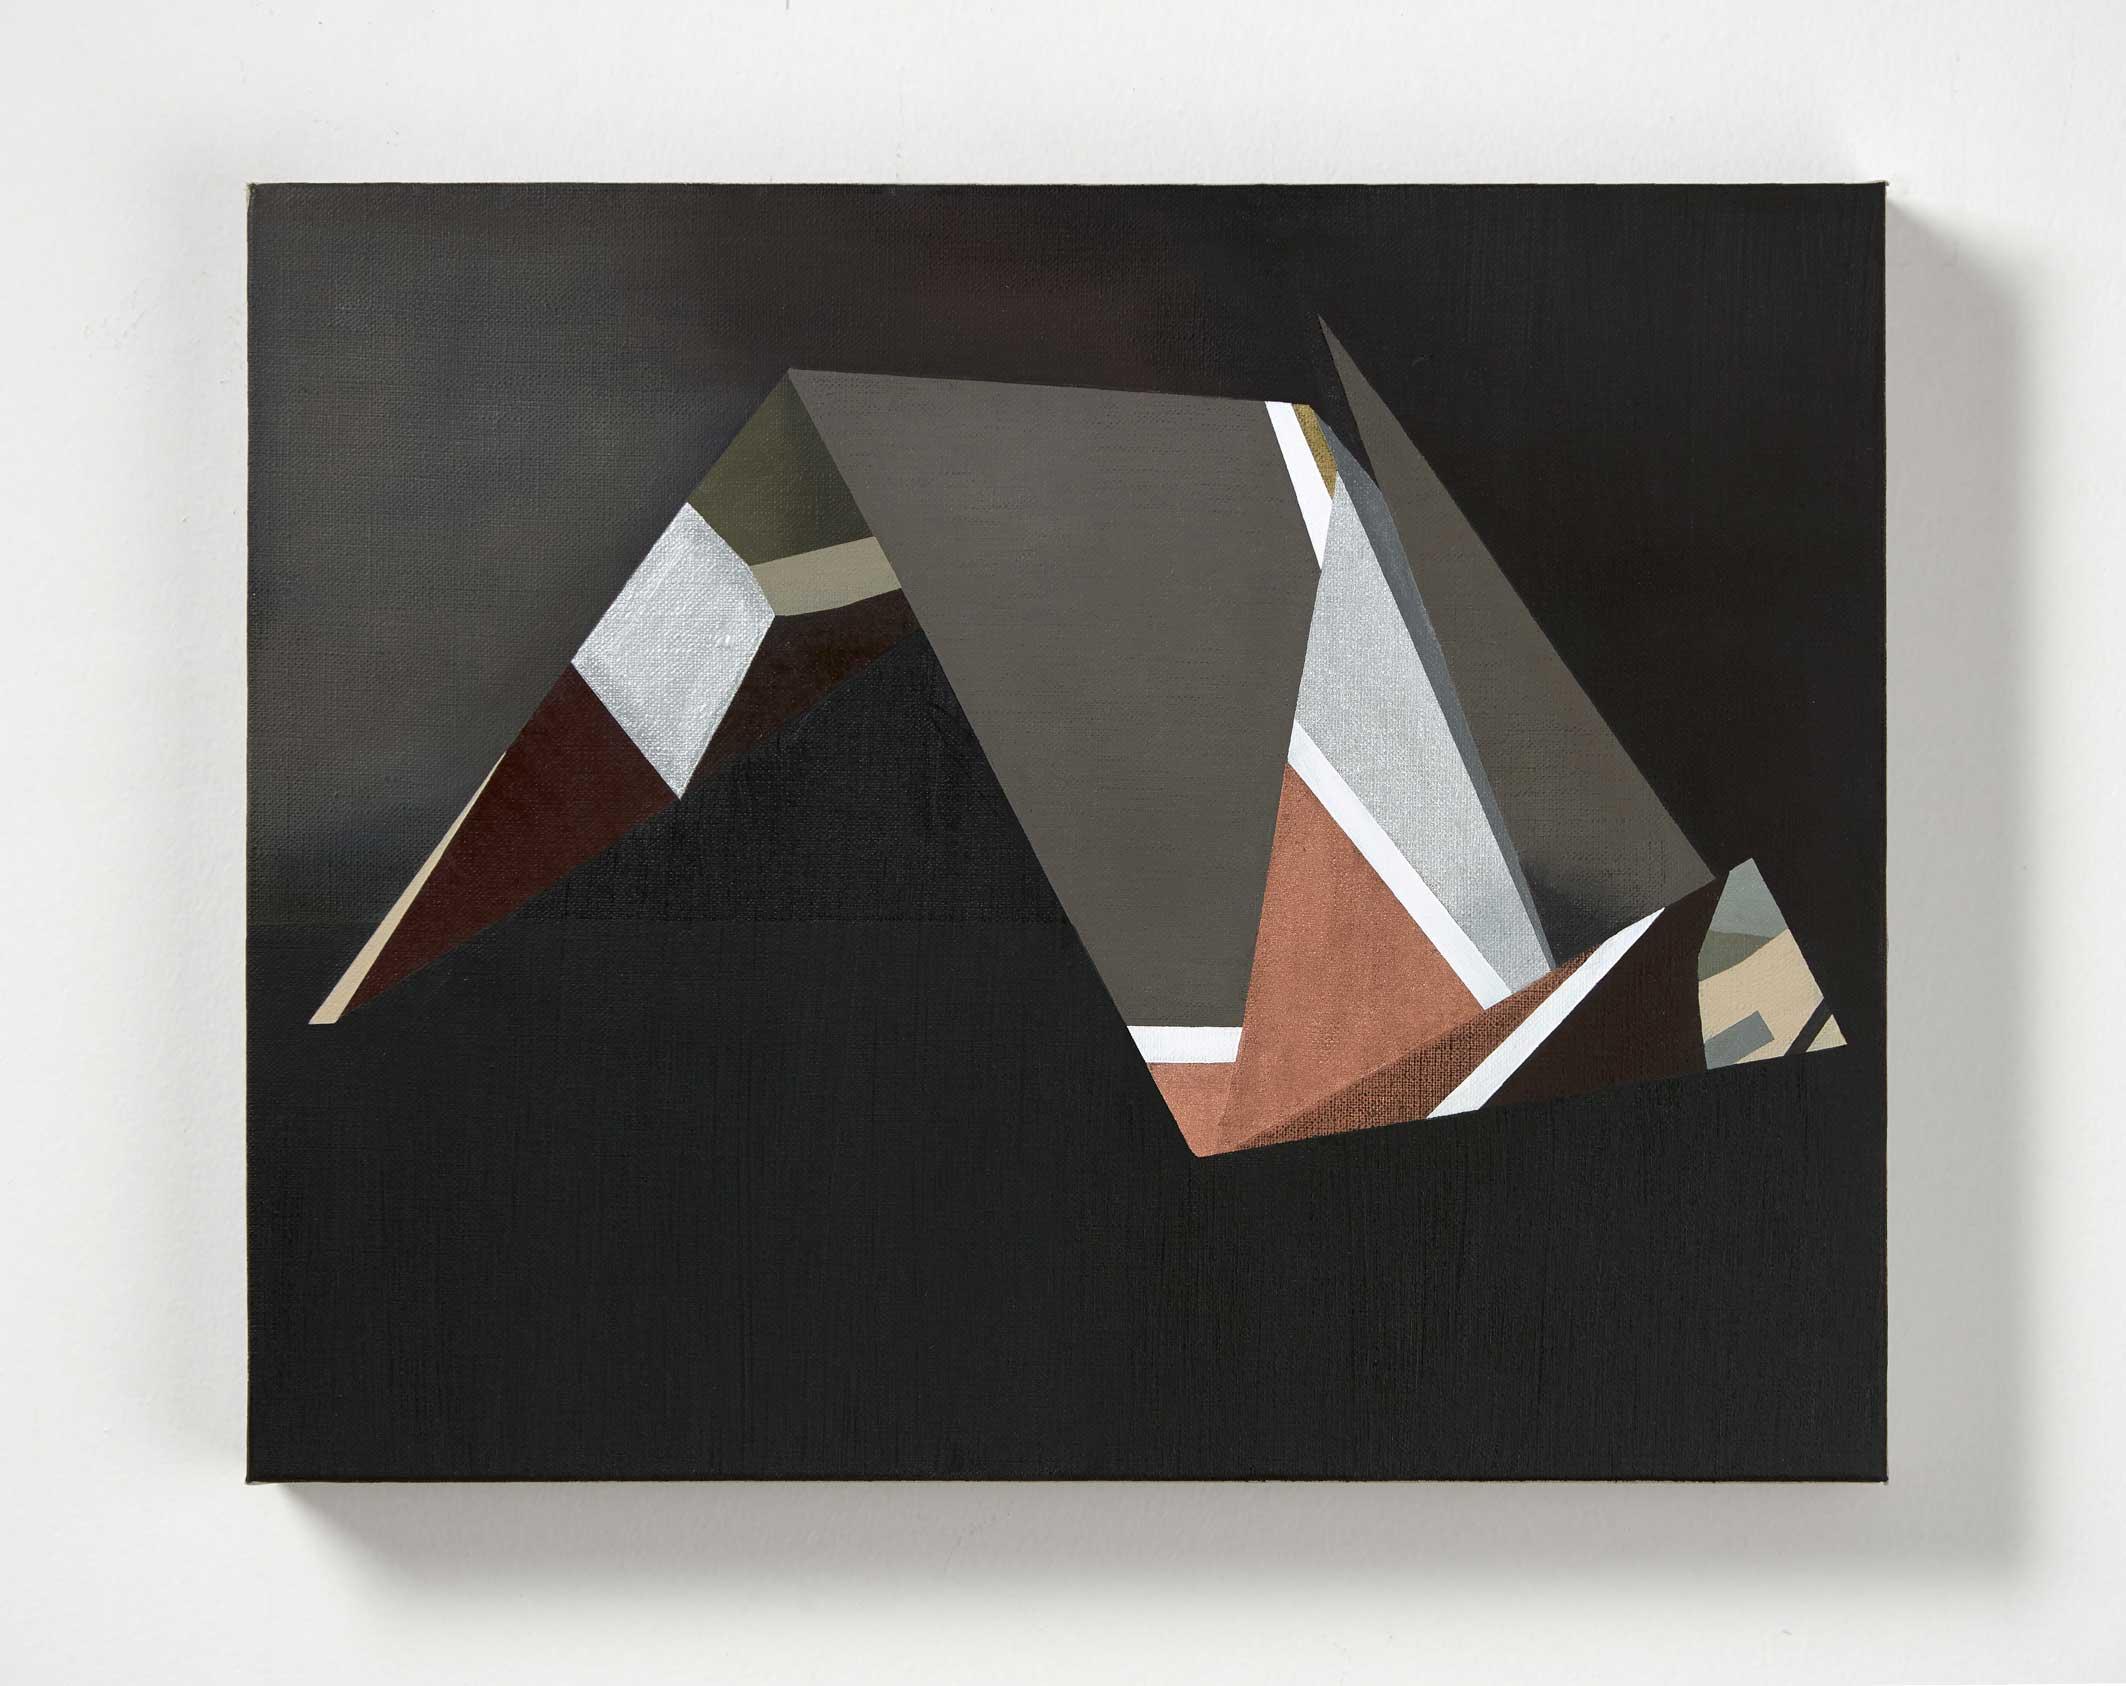 Andrea Eckersley, Partial Penumbra, 2017. Oil on linen, 45 x 35cm LR.